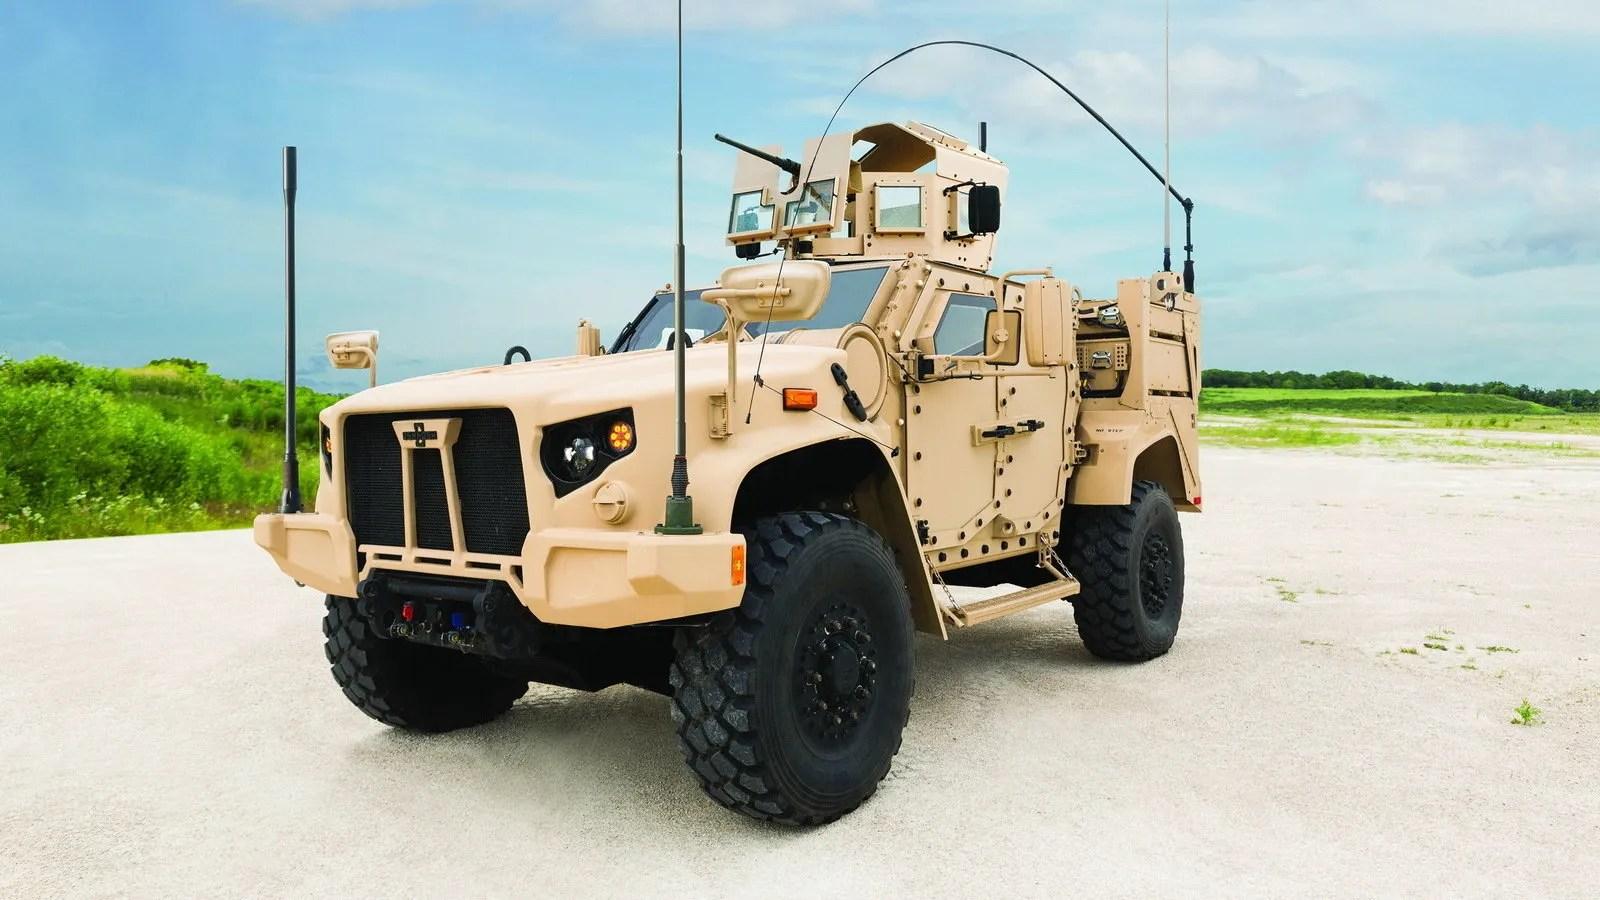 2017 Oshkosh Joint Light Tactical Vehicle Top Speed